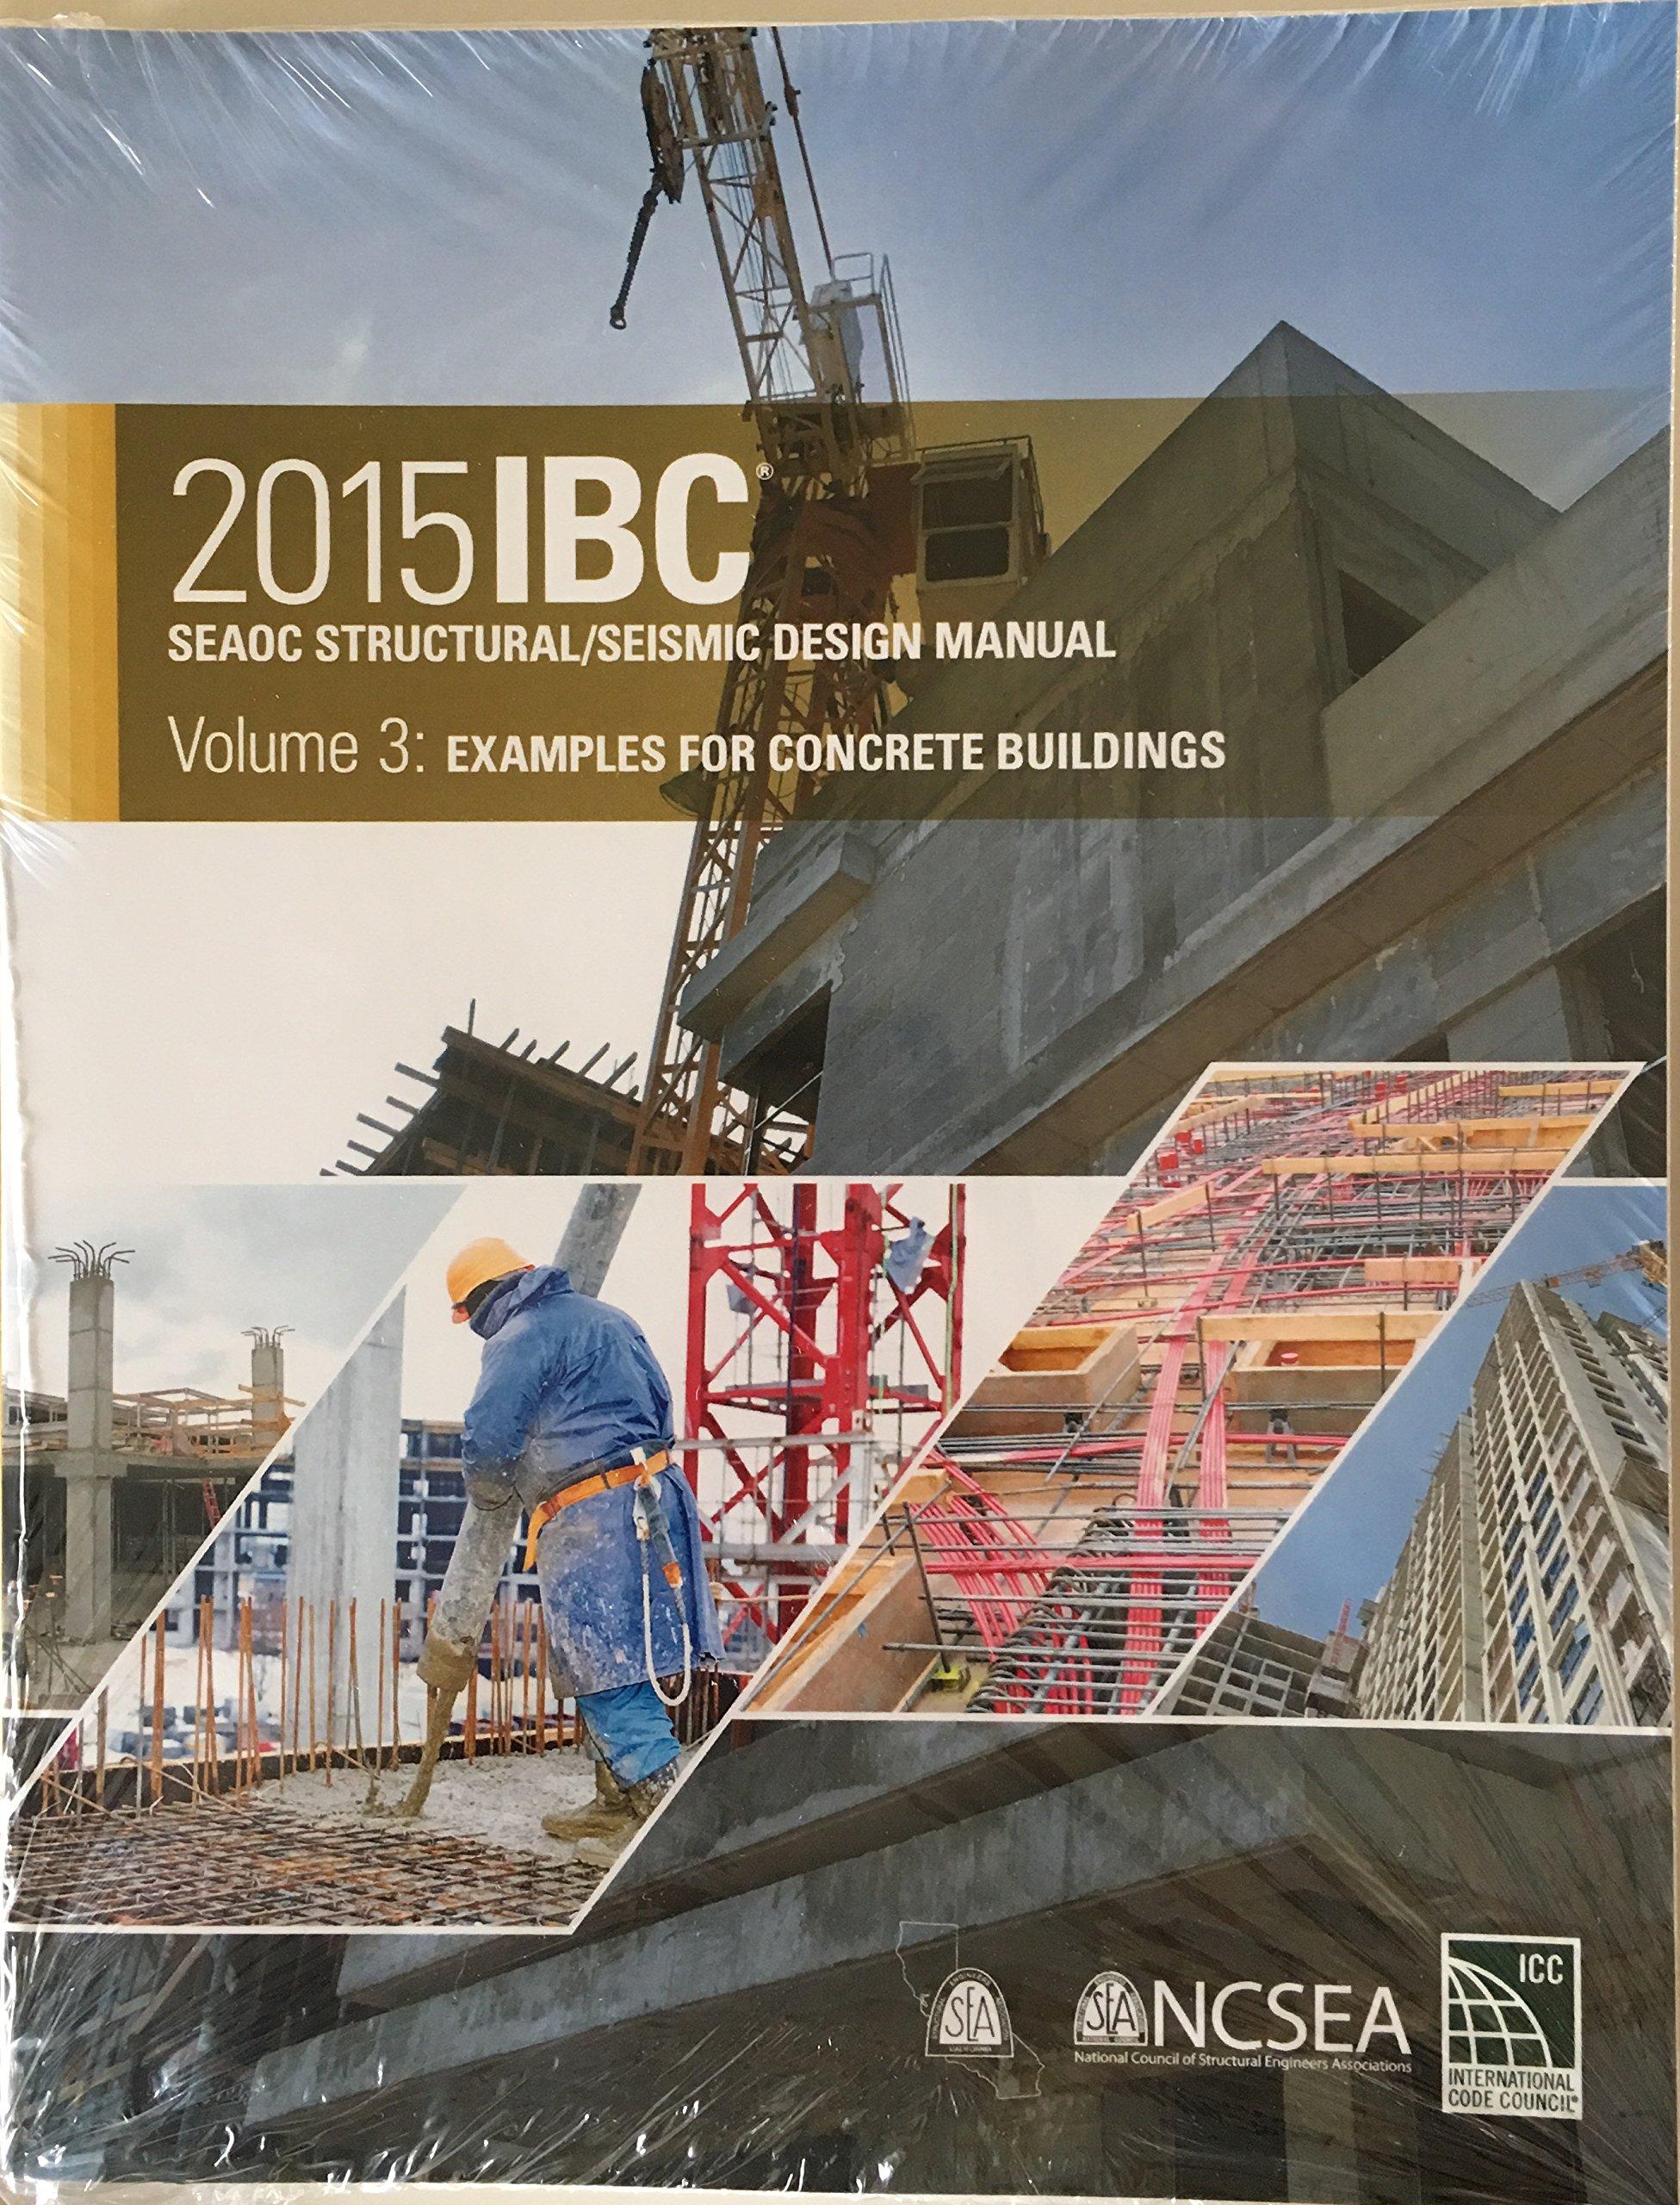 2015 IBC SEAOC Structural/Seismic Design Manual Volume 3: Examples for  Concrete Buildings: 9781609836511: Amazon.com: Books